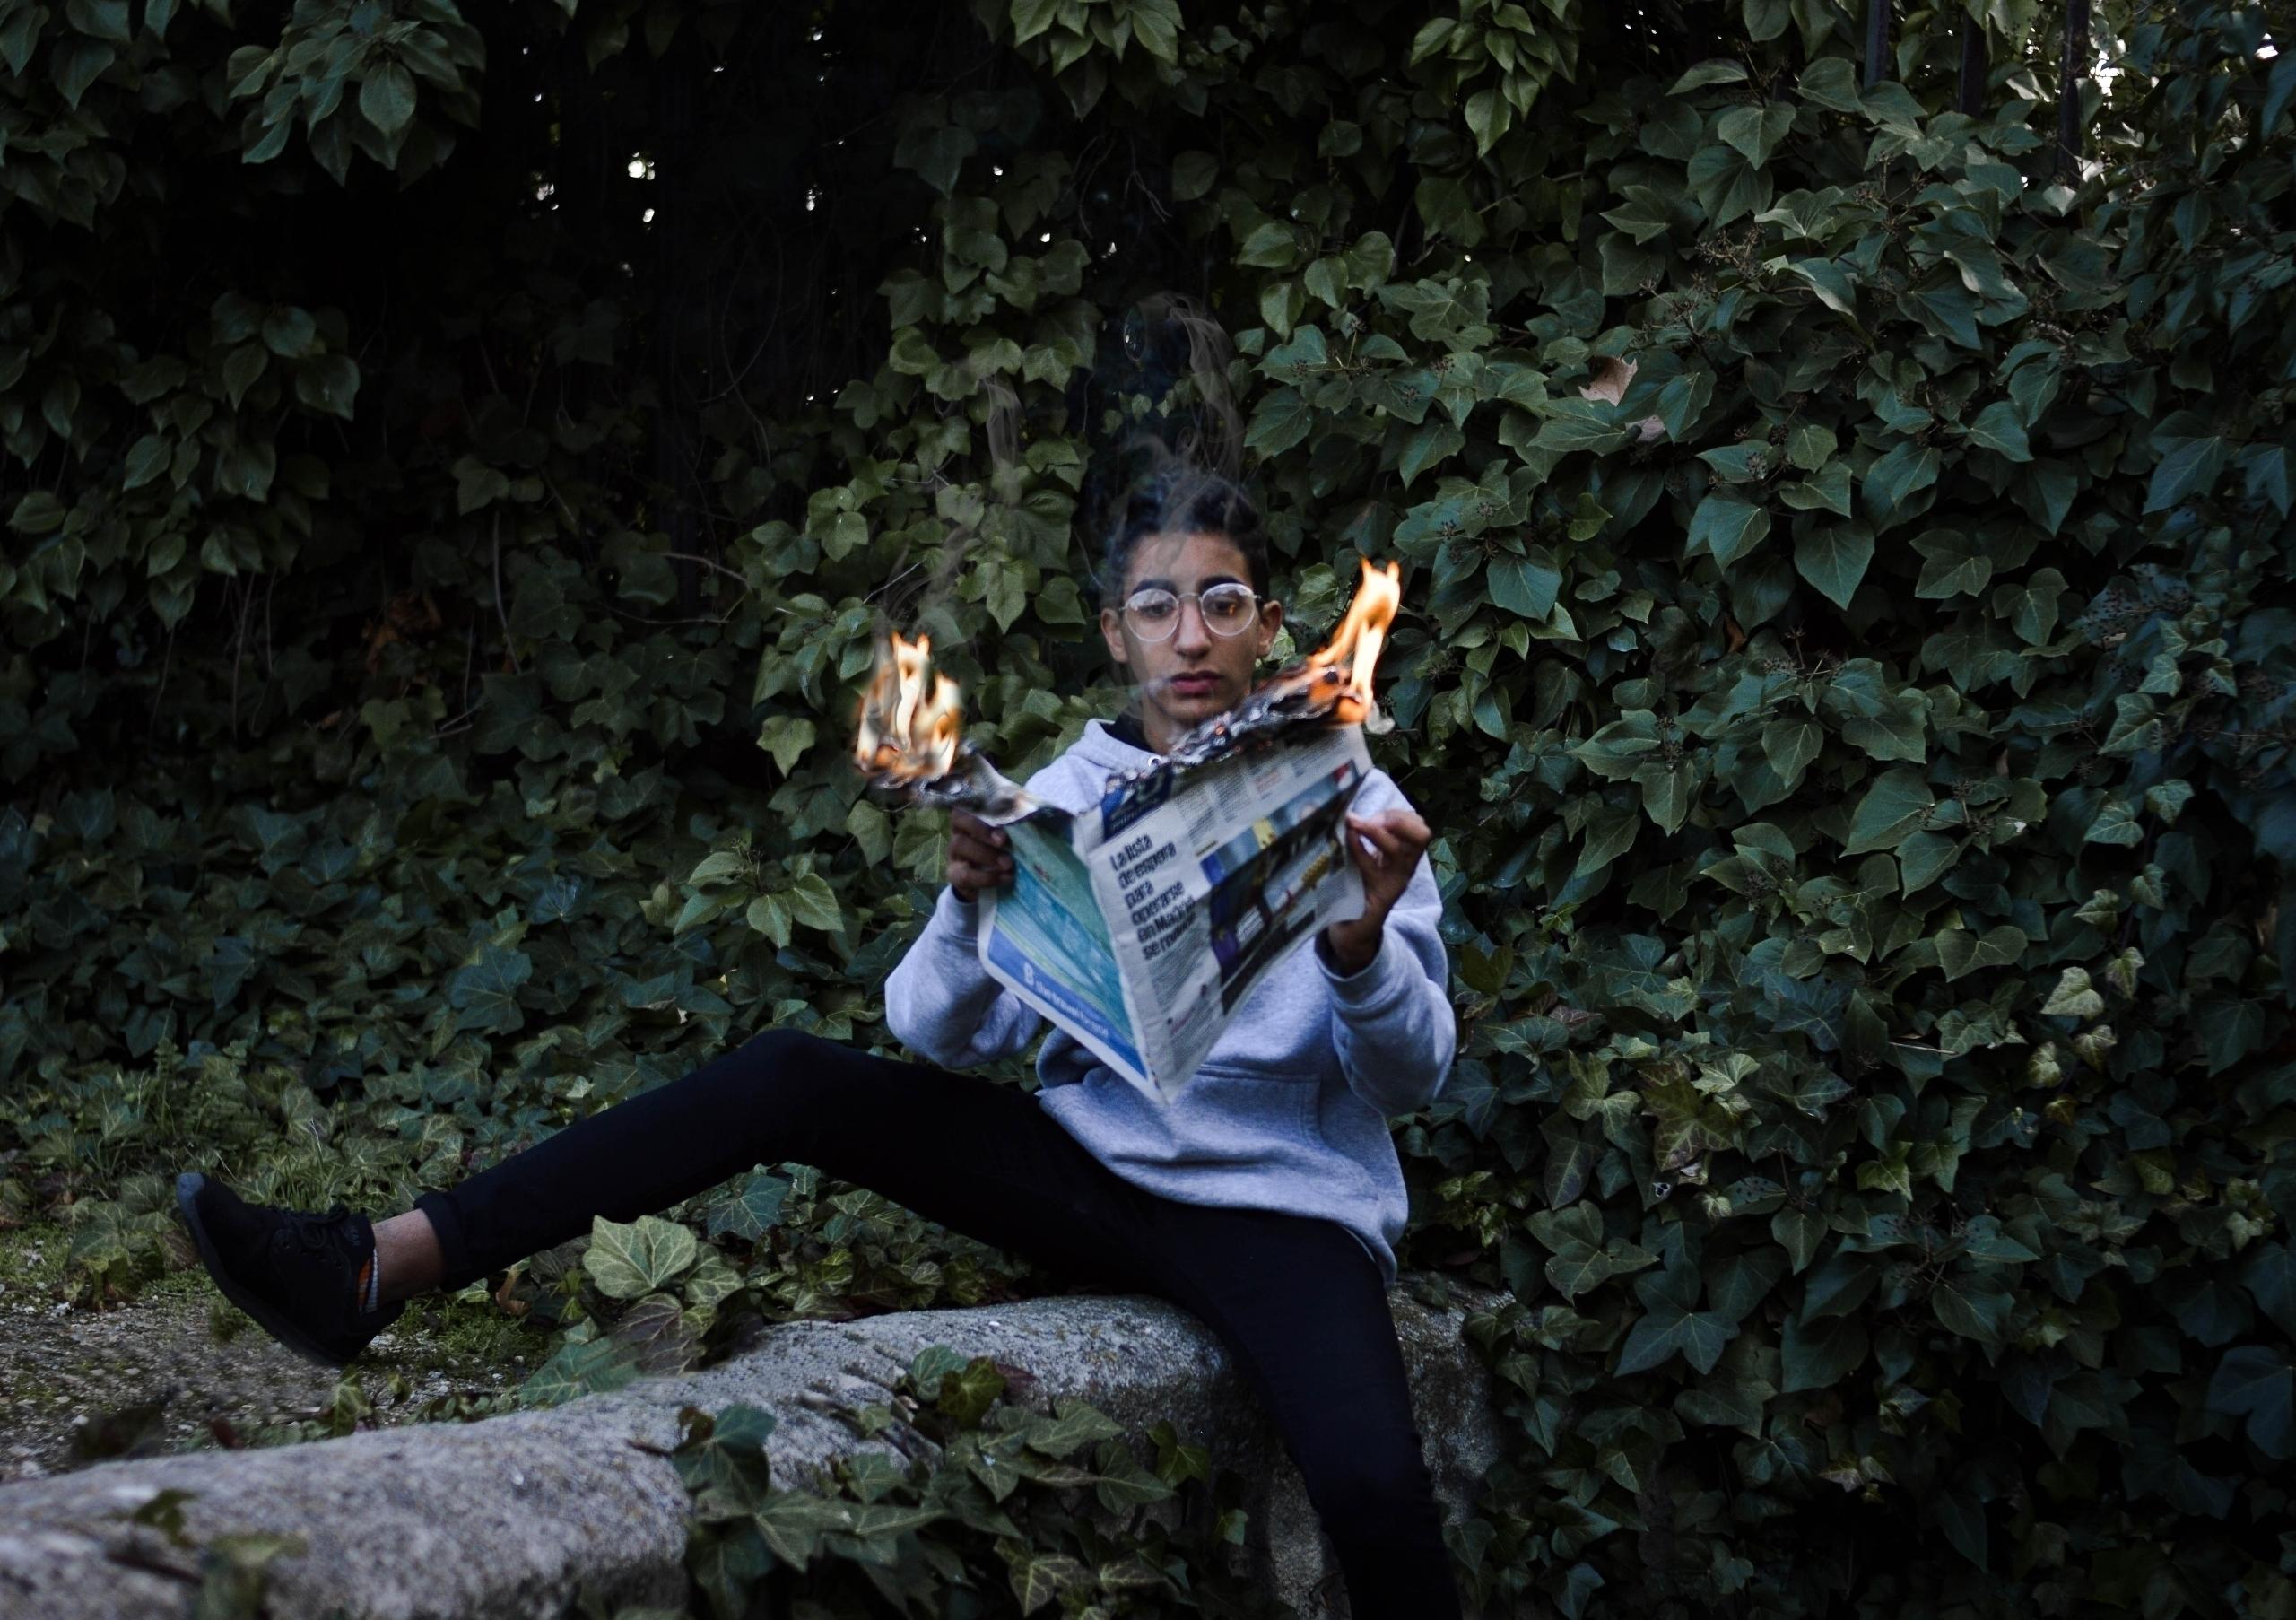 burning º - model, fashion, photographer - aayubess | ello